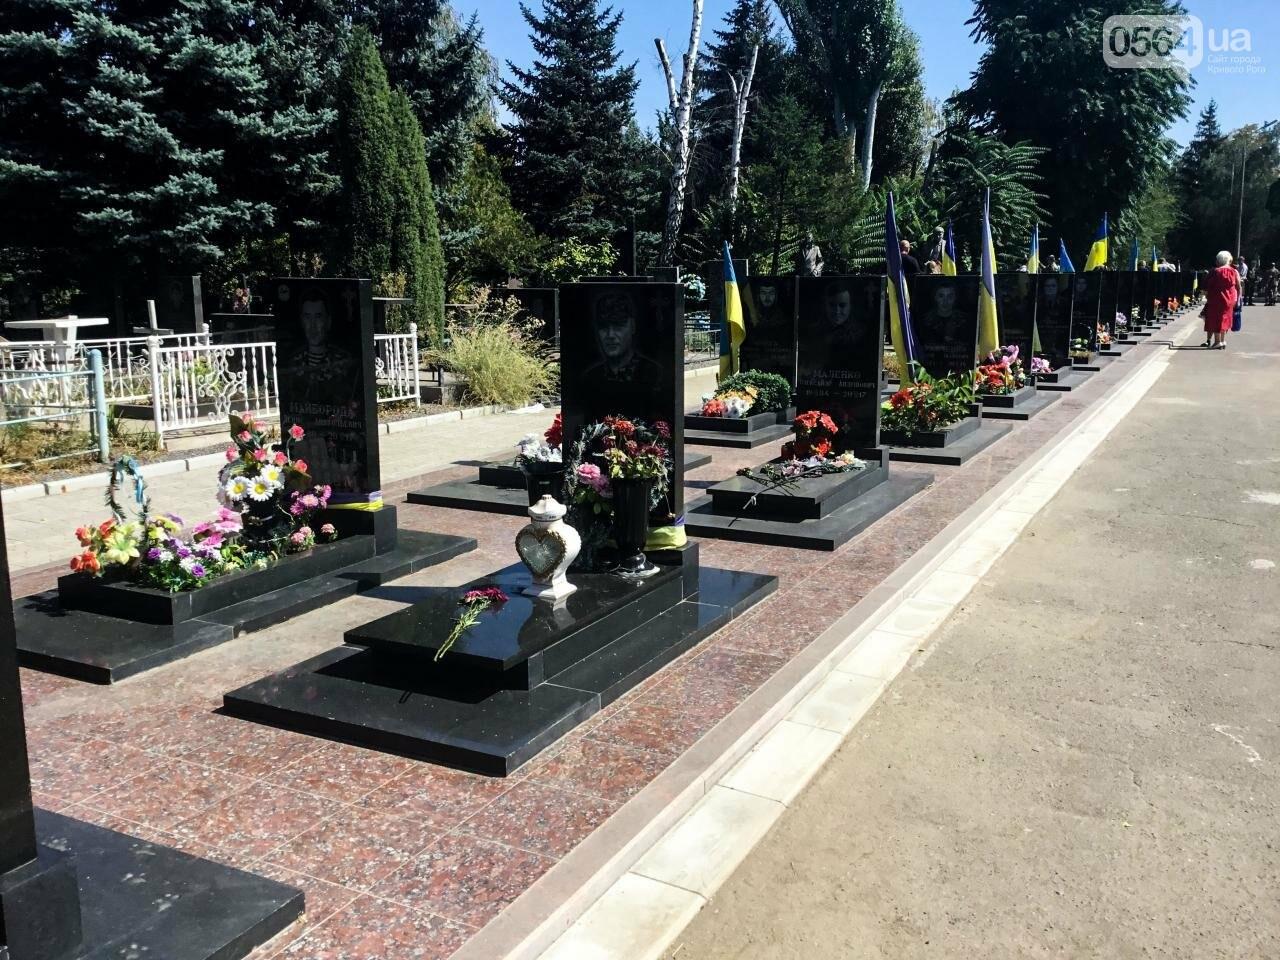 На Аллее Героев провели панихиду по погибшим в зоне АТО криворожанам, - ФОТО , фото-38